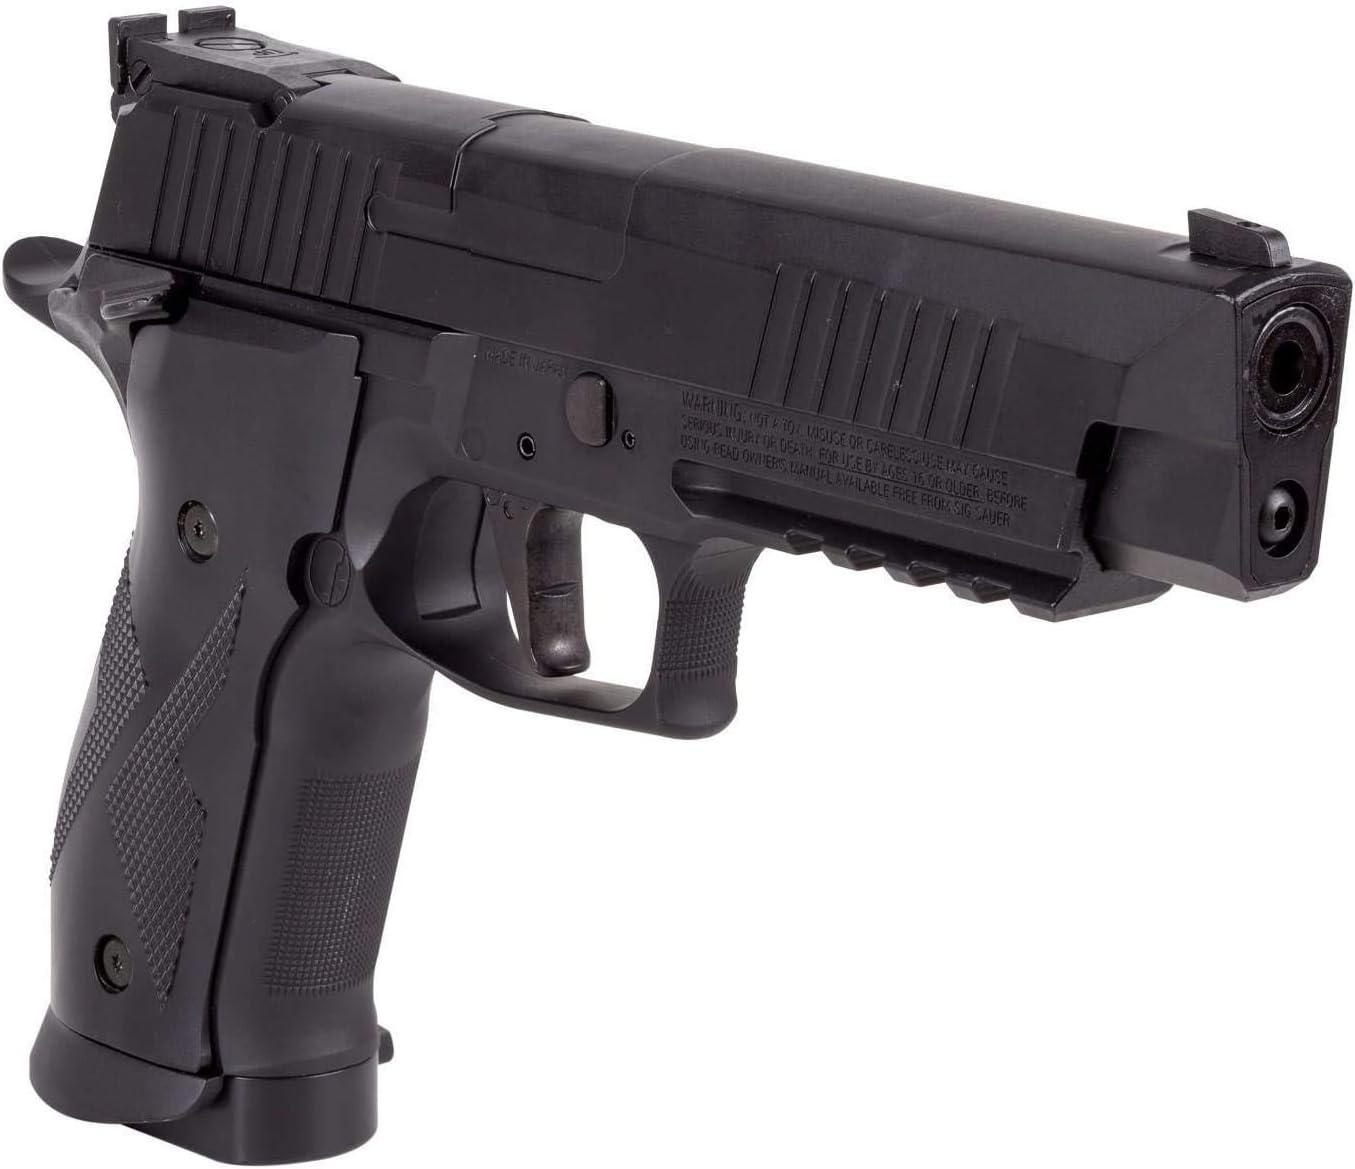 S g S uer X-Five Air Pistol with Bundle Air Guns & Accessories ...